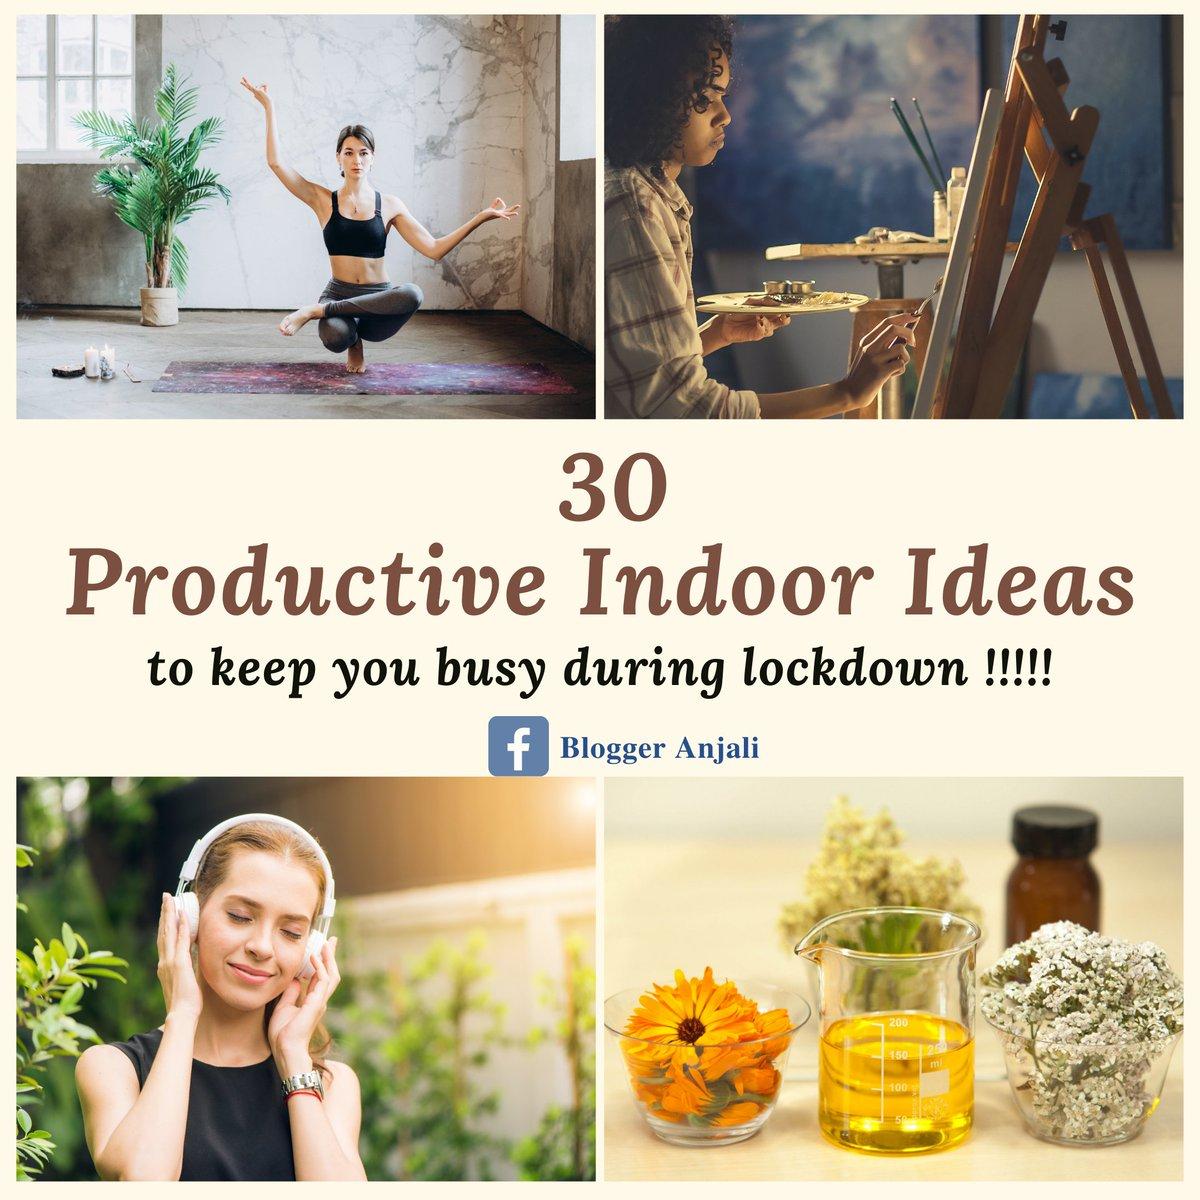 Click here to know the interesting ideas👇  #Productivity #indoor #ItsOkayToNotBeOkay #QuarantineLife #stayhome